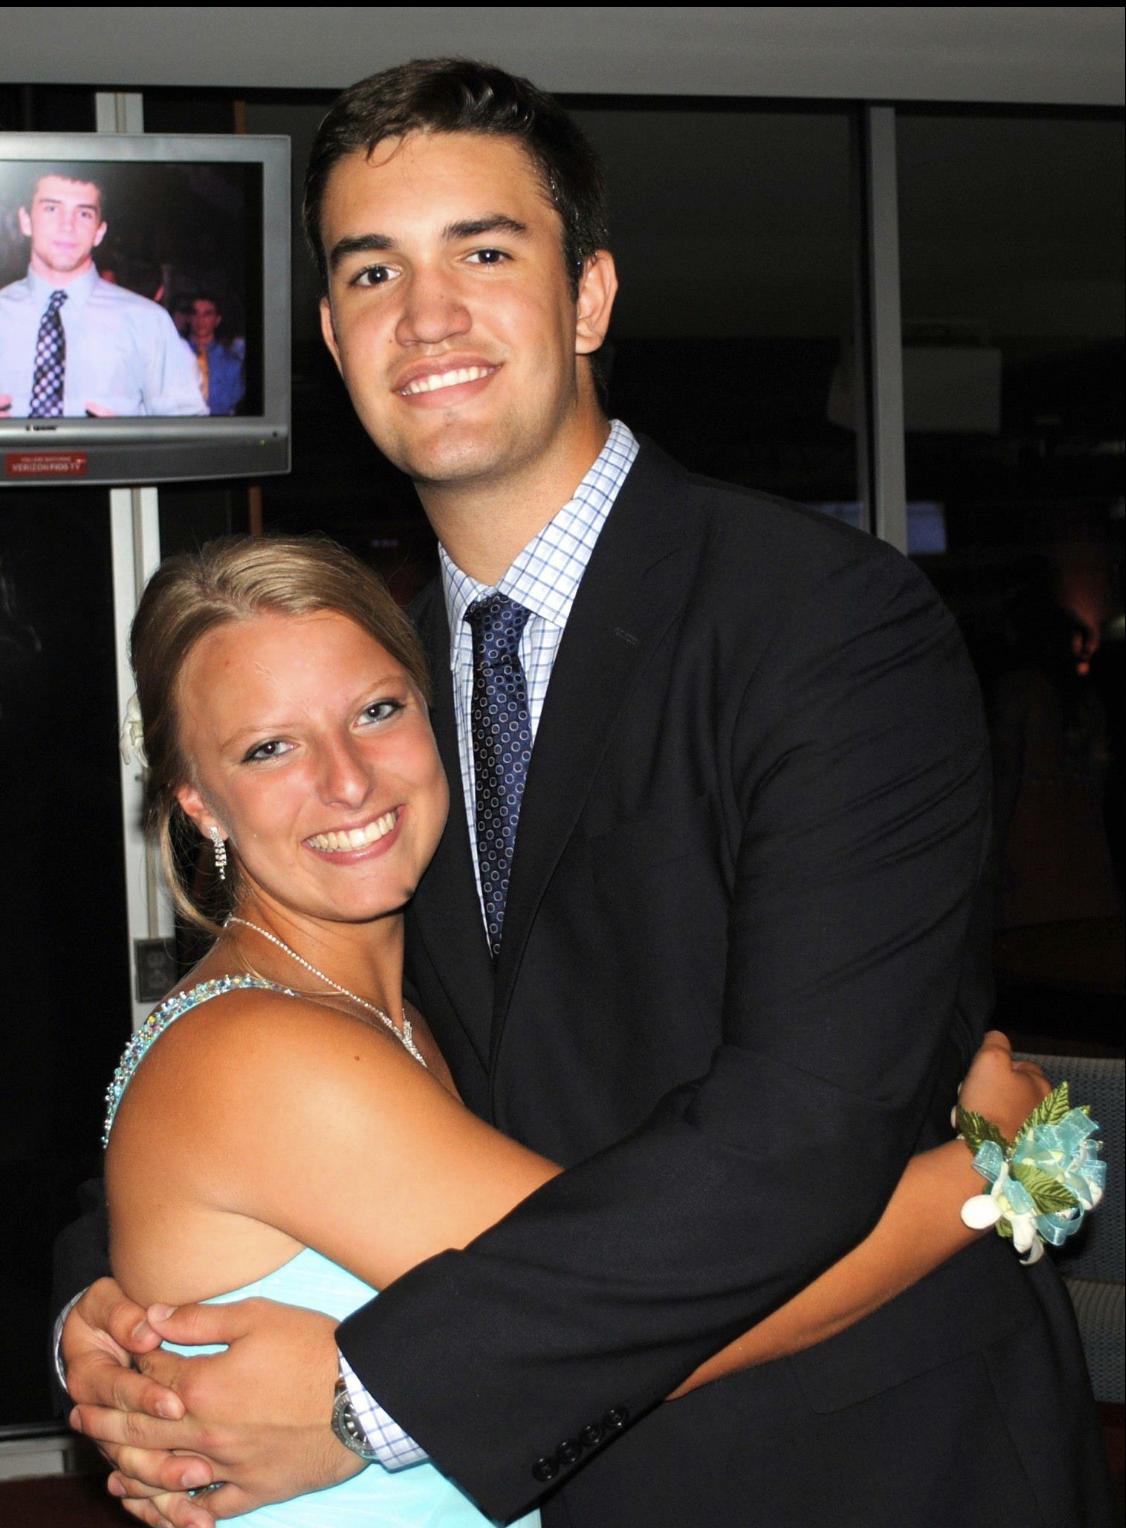 Image 20 of Kaleigh and Brad